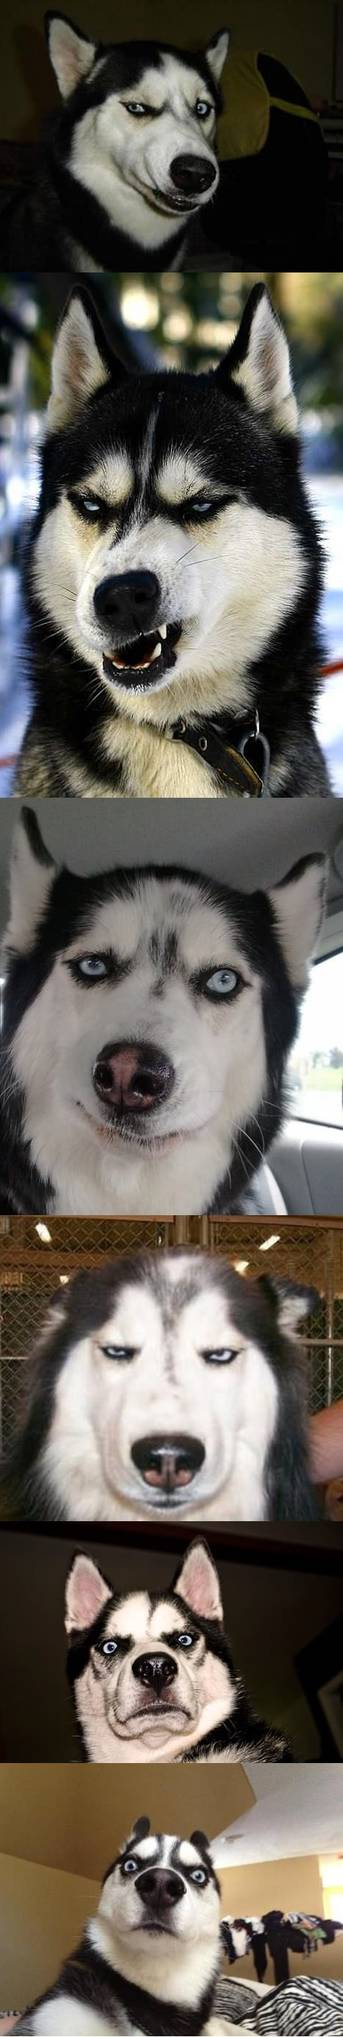 Penggemar Rage atau Meme tau siapa anjing ini. :D (more wow) >do you know them? > http://pulsk.com/134072